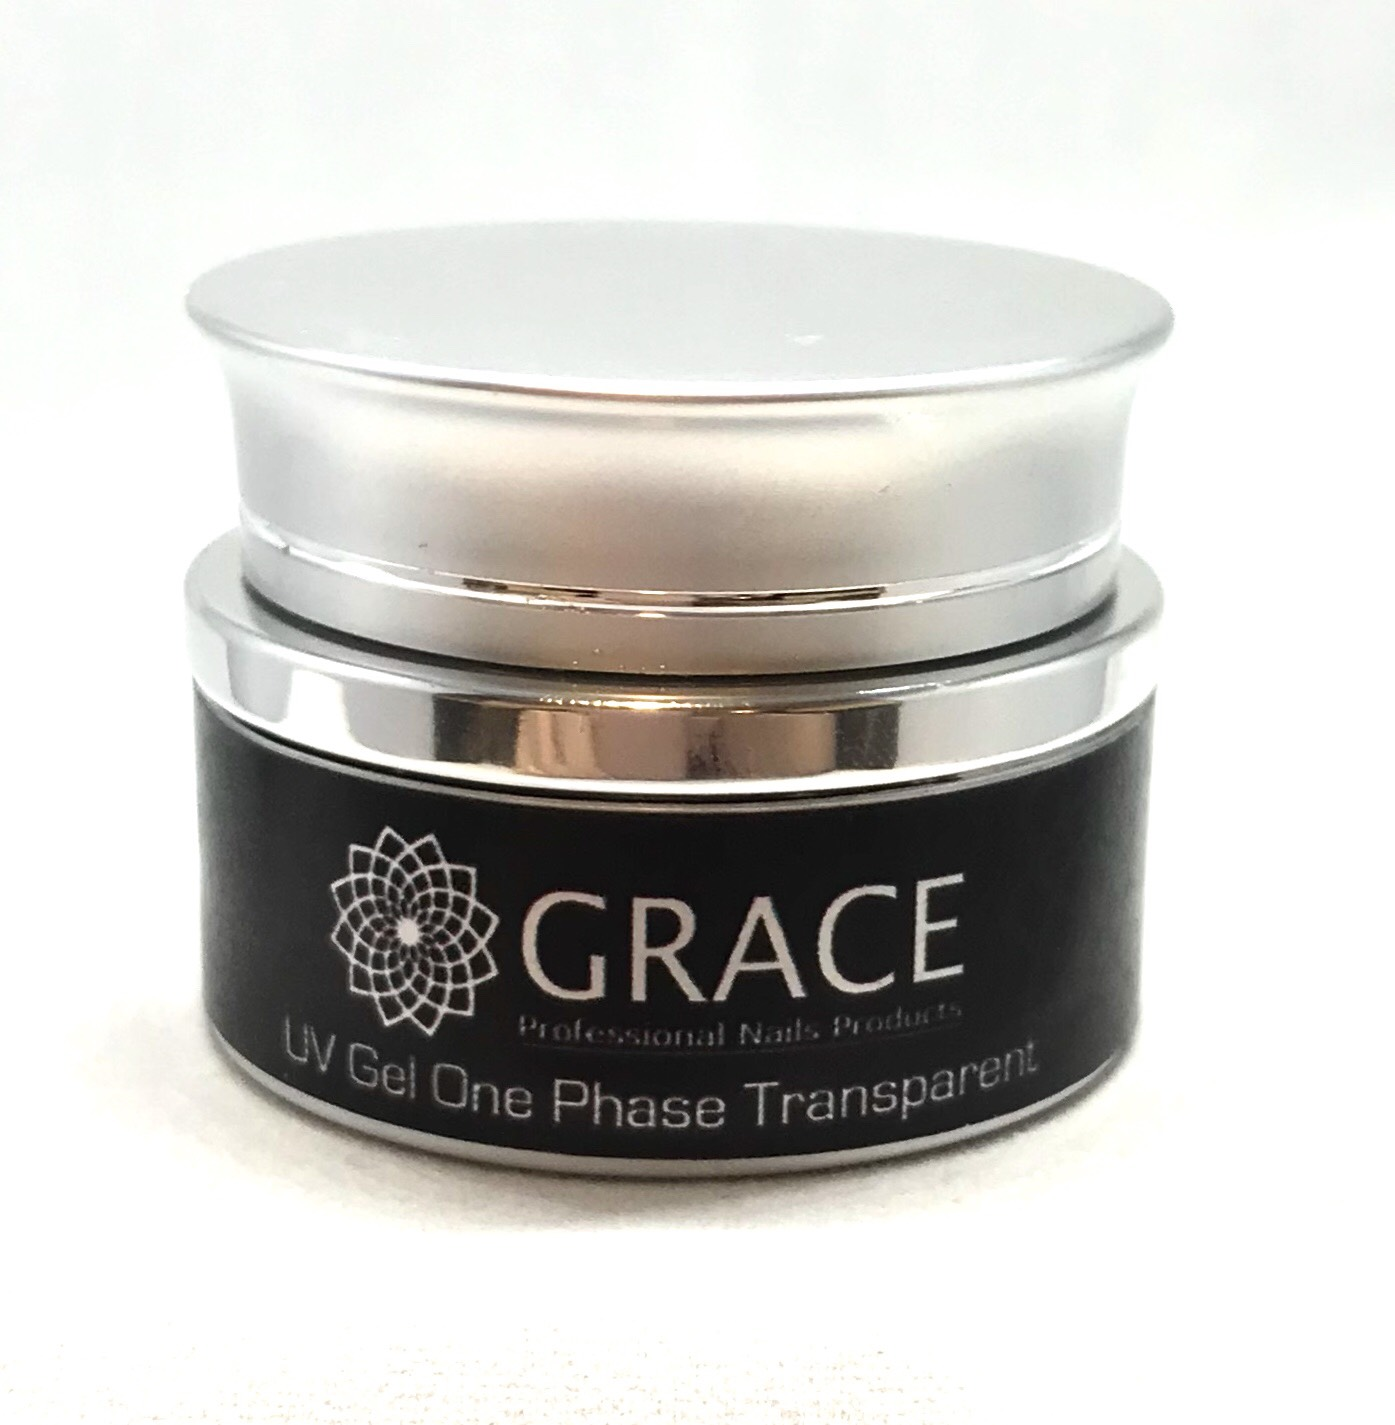 uv gel one phase trasparente 15ml